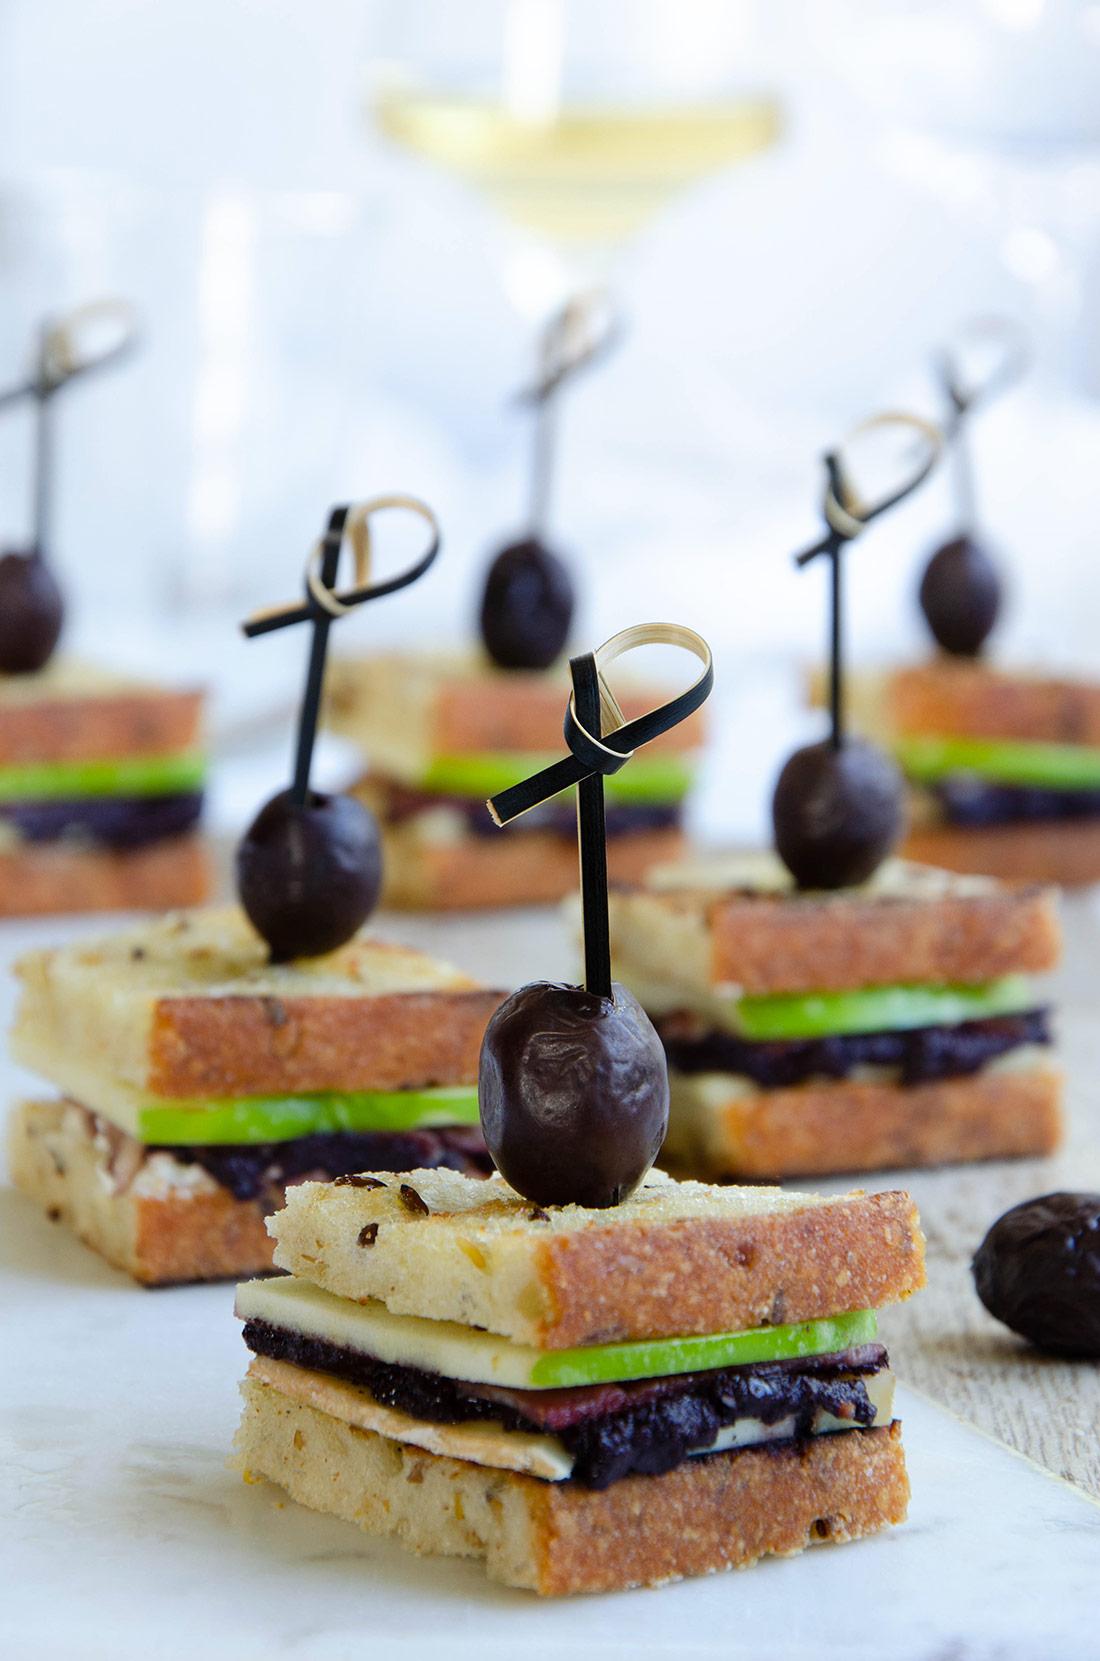 Mini sandwiches magret pomme chèvre olives